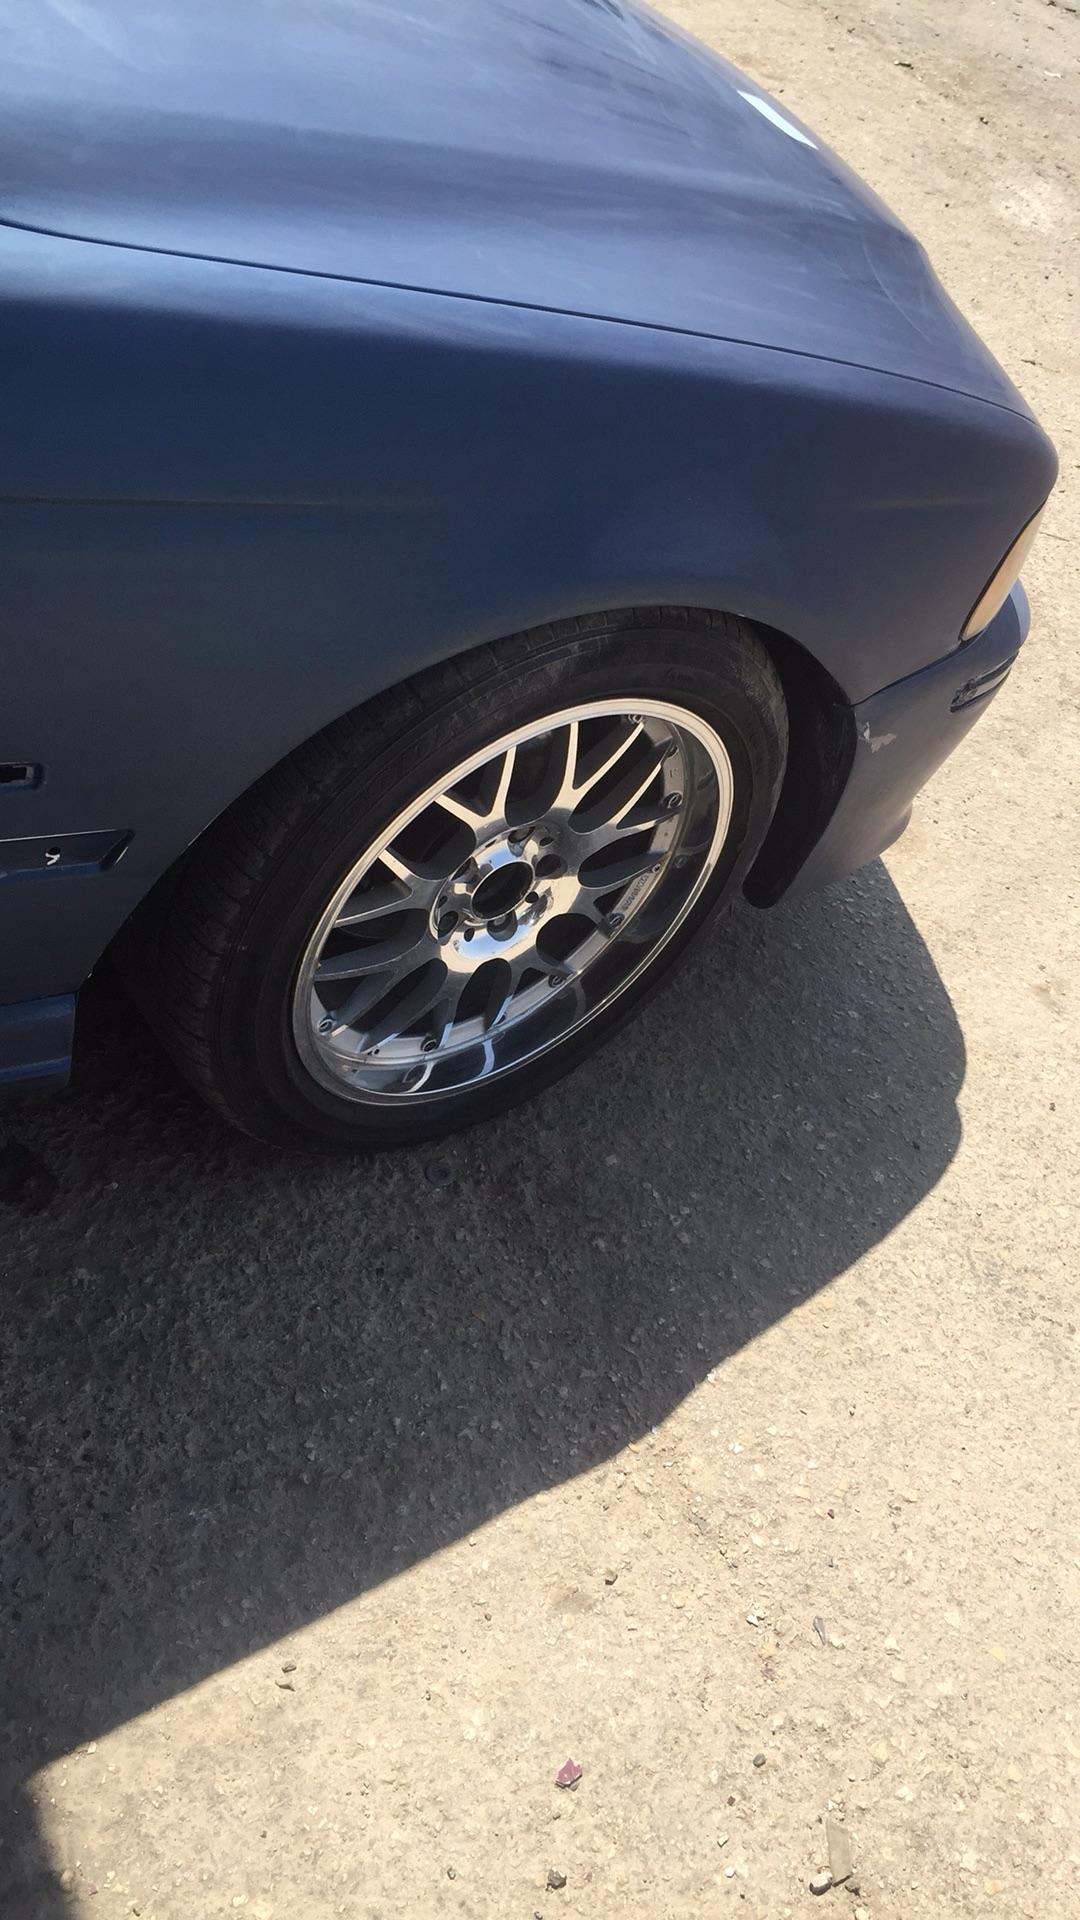 Tire.ae لإطارات السياراتمن خلال التركيز على مزج دعم العملاء الممتاز مع المبيعات، تقدم Tire.ae -  جنط bmw لا تنسَ أنك شاهدت...